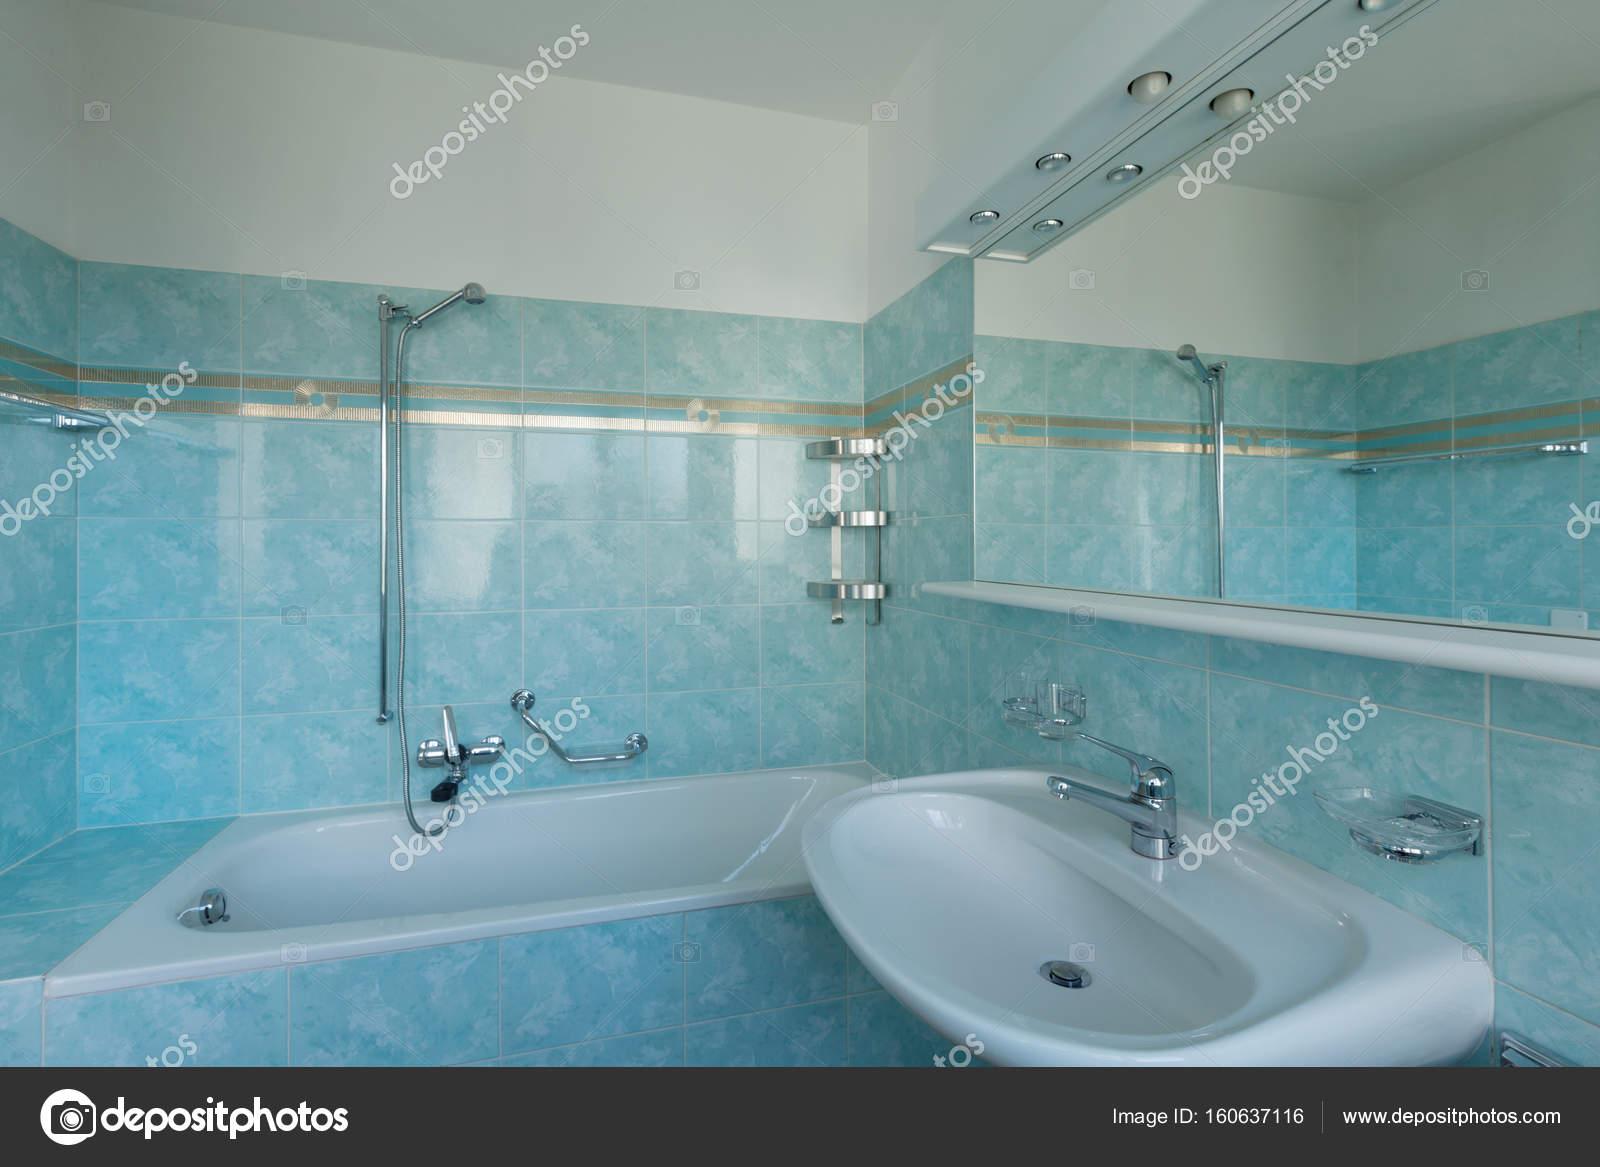 Salle de bain Vintage bleu — Photographie Zveiger © #160637116